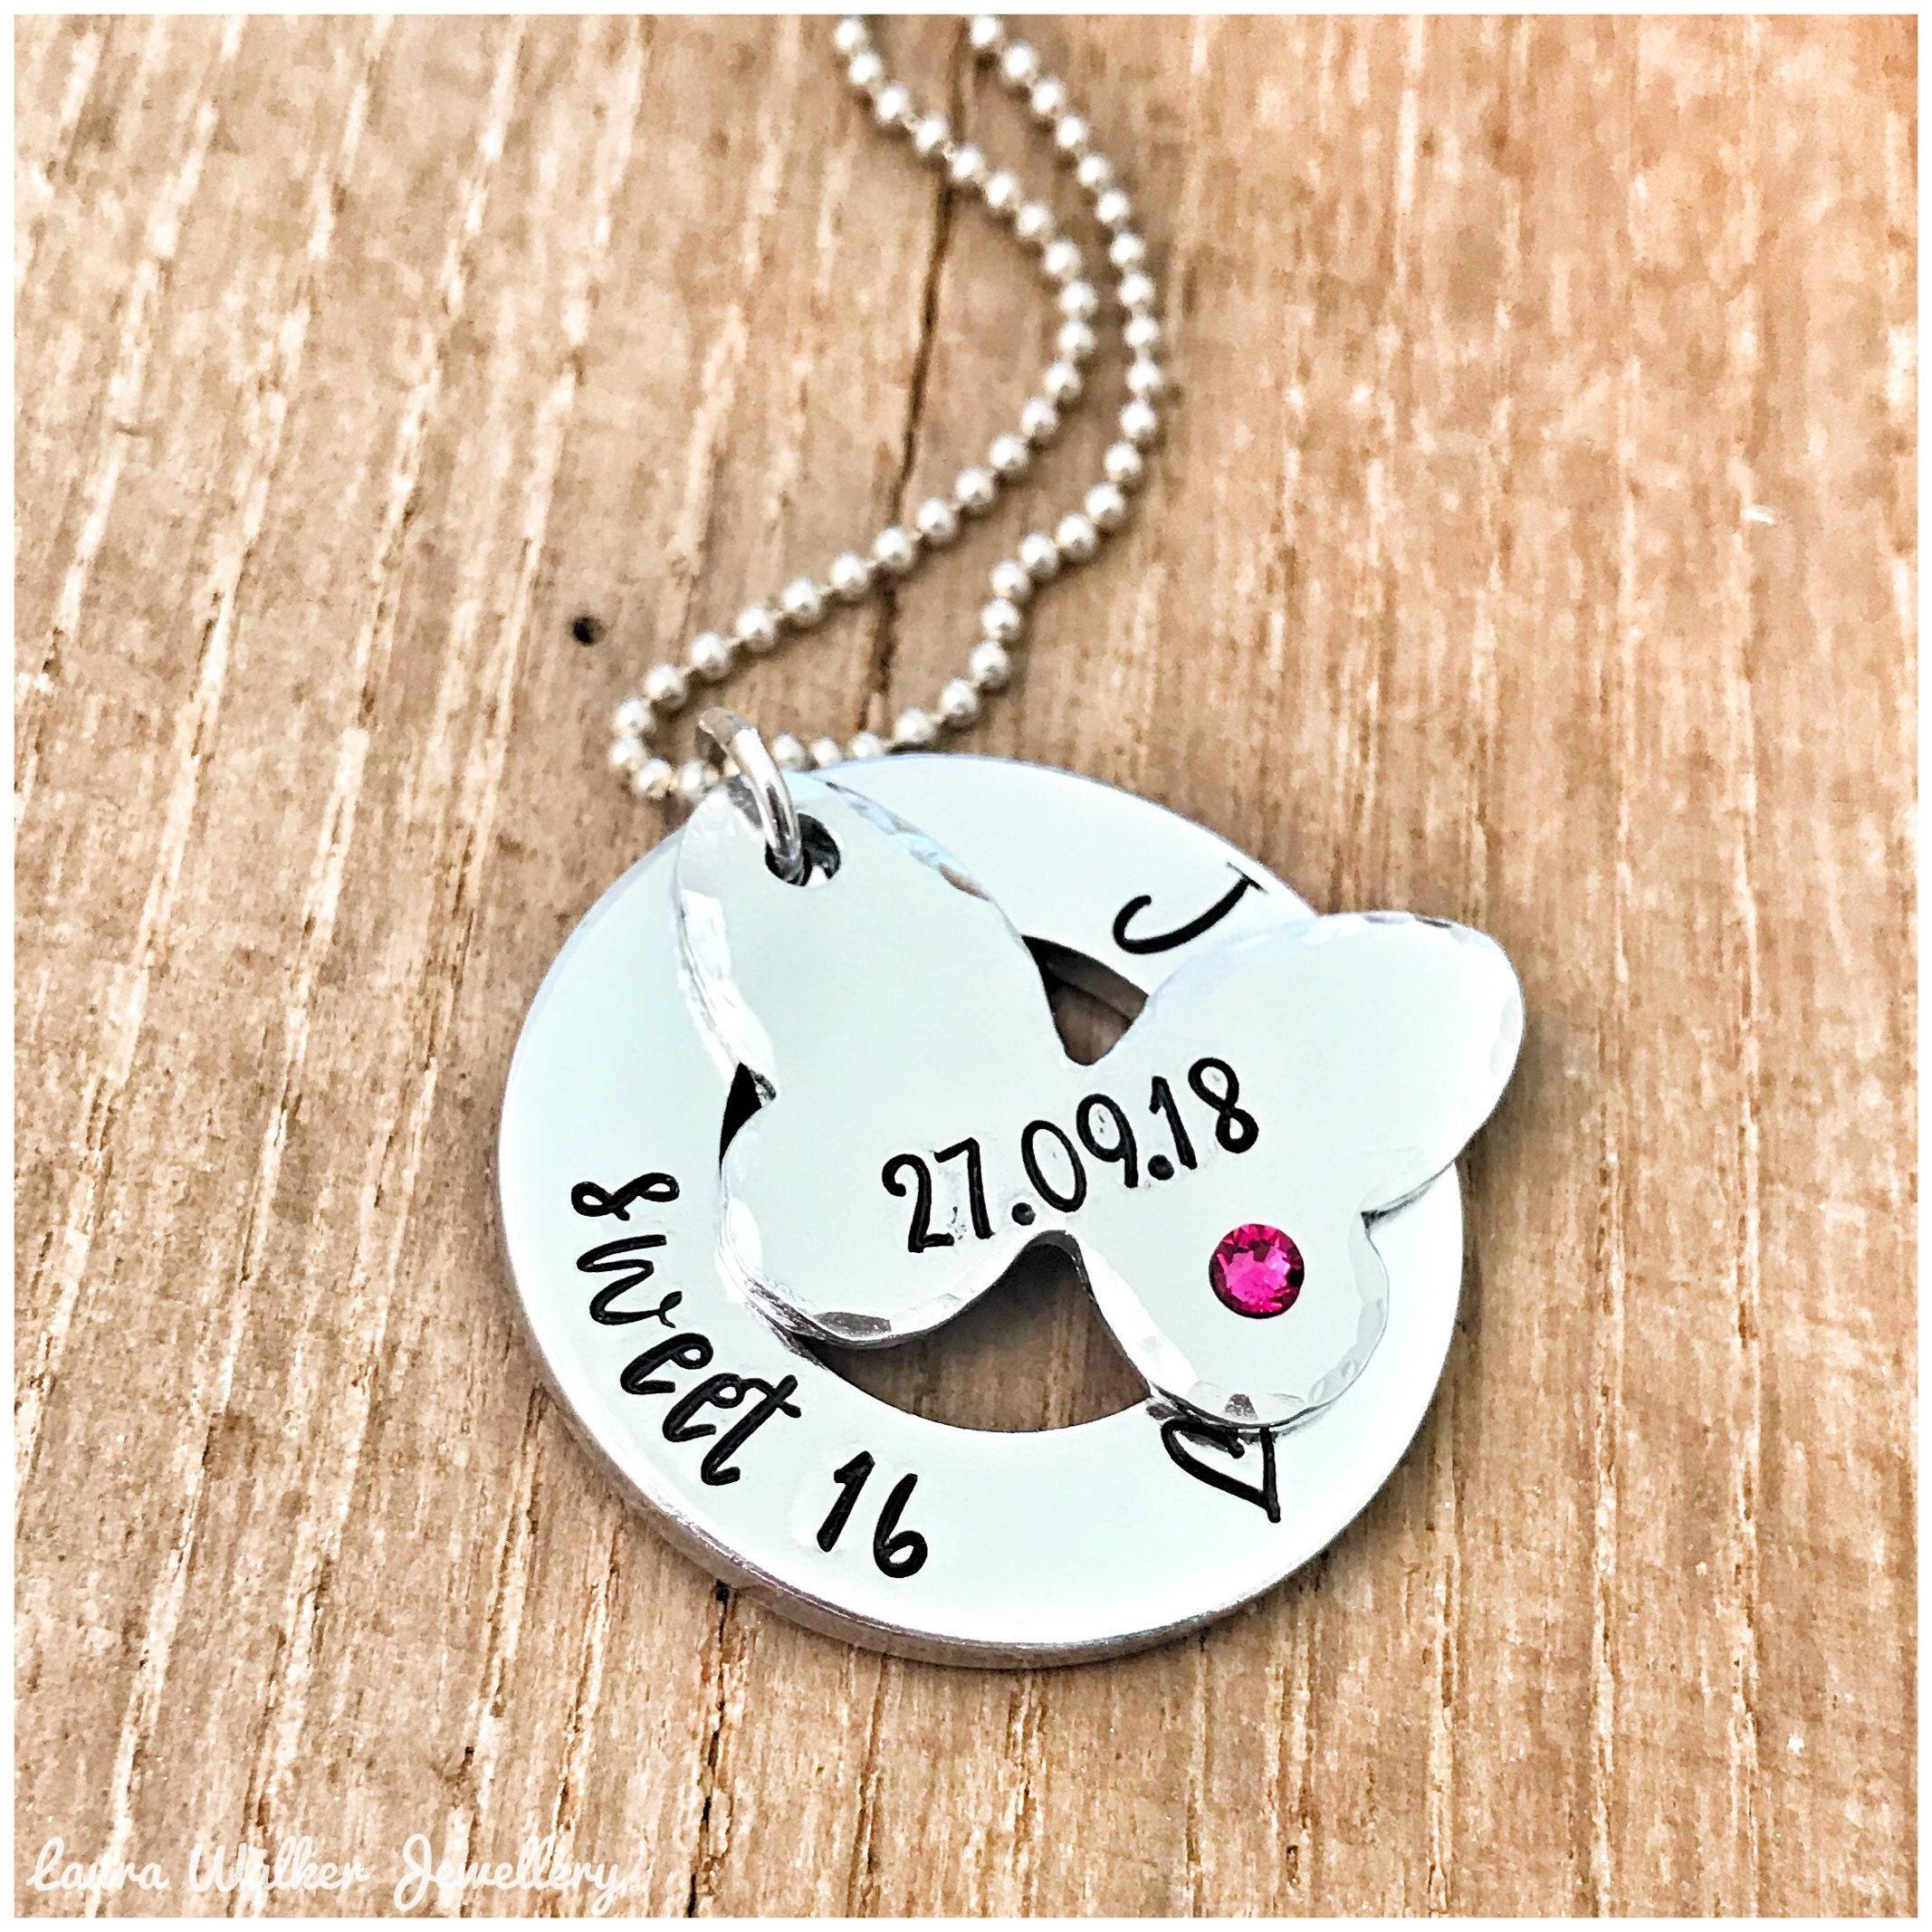 16th Birthday Necklace Sweet 16 Pendant 16th Birthday Gift